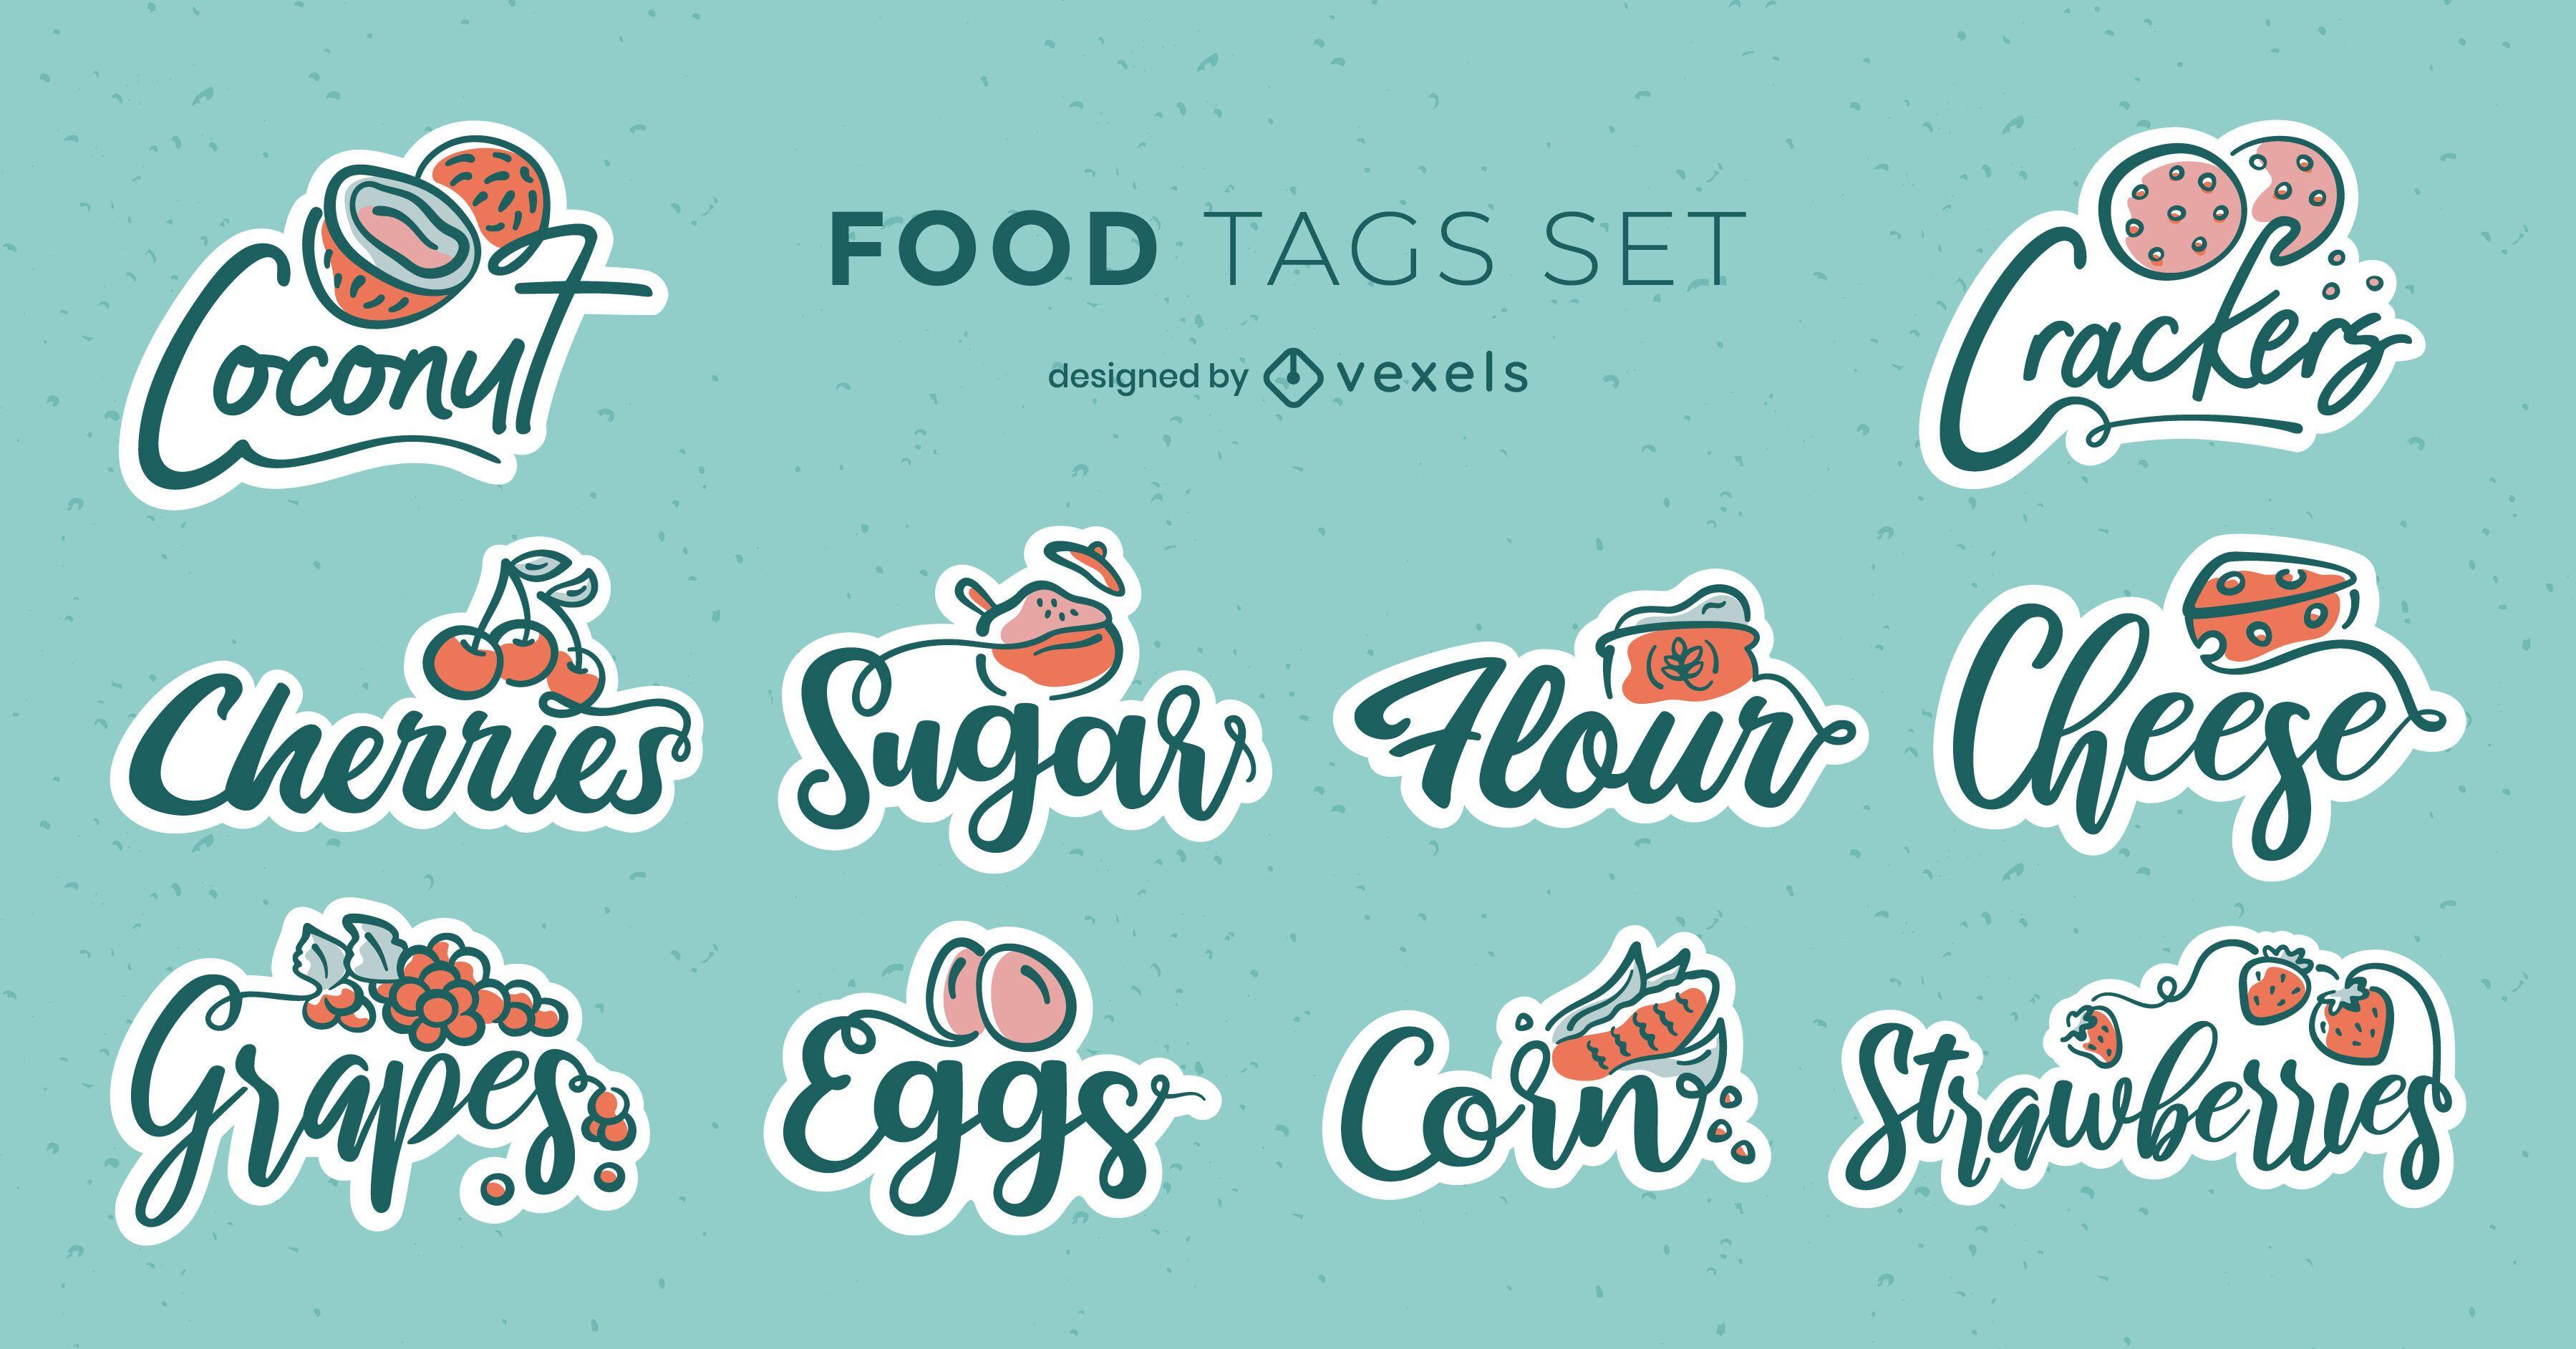 Lebensmittel Zutaten Abzeichen Schriftzug Set